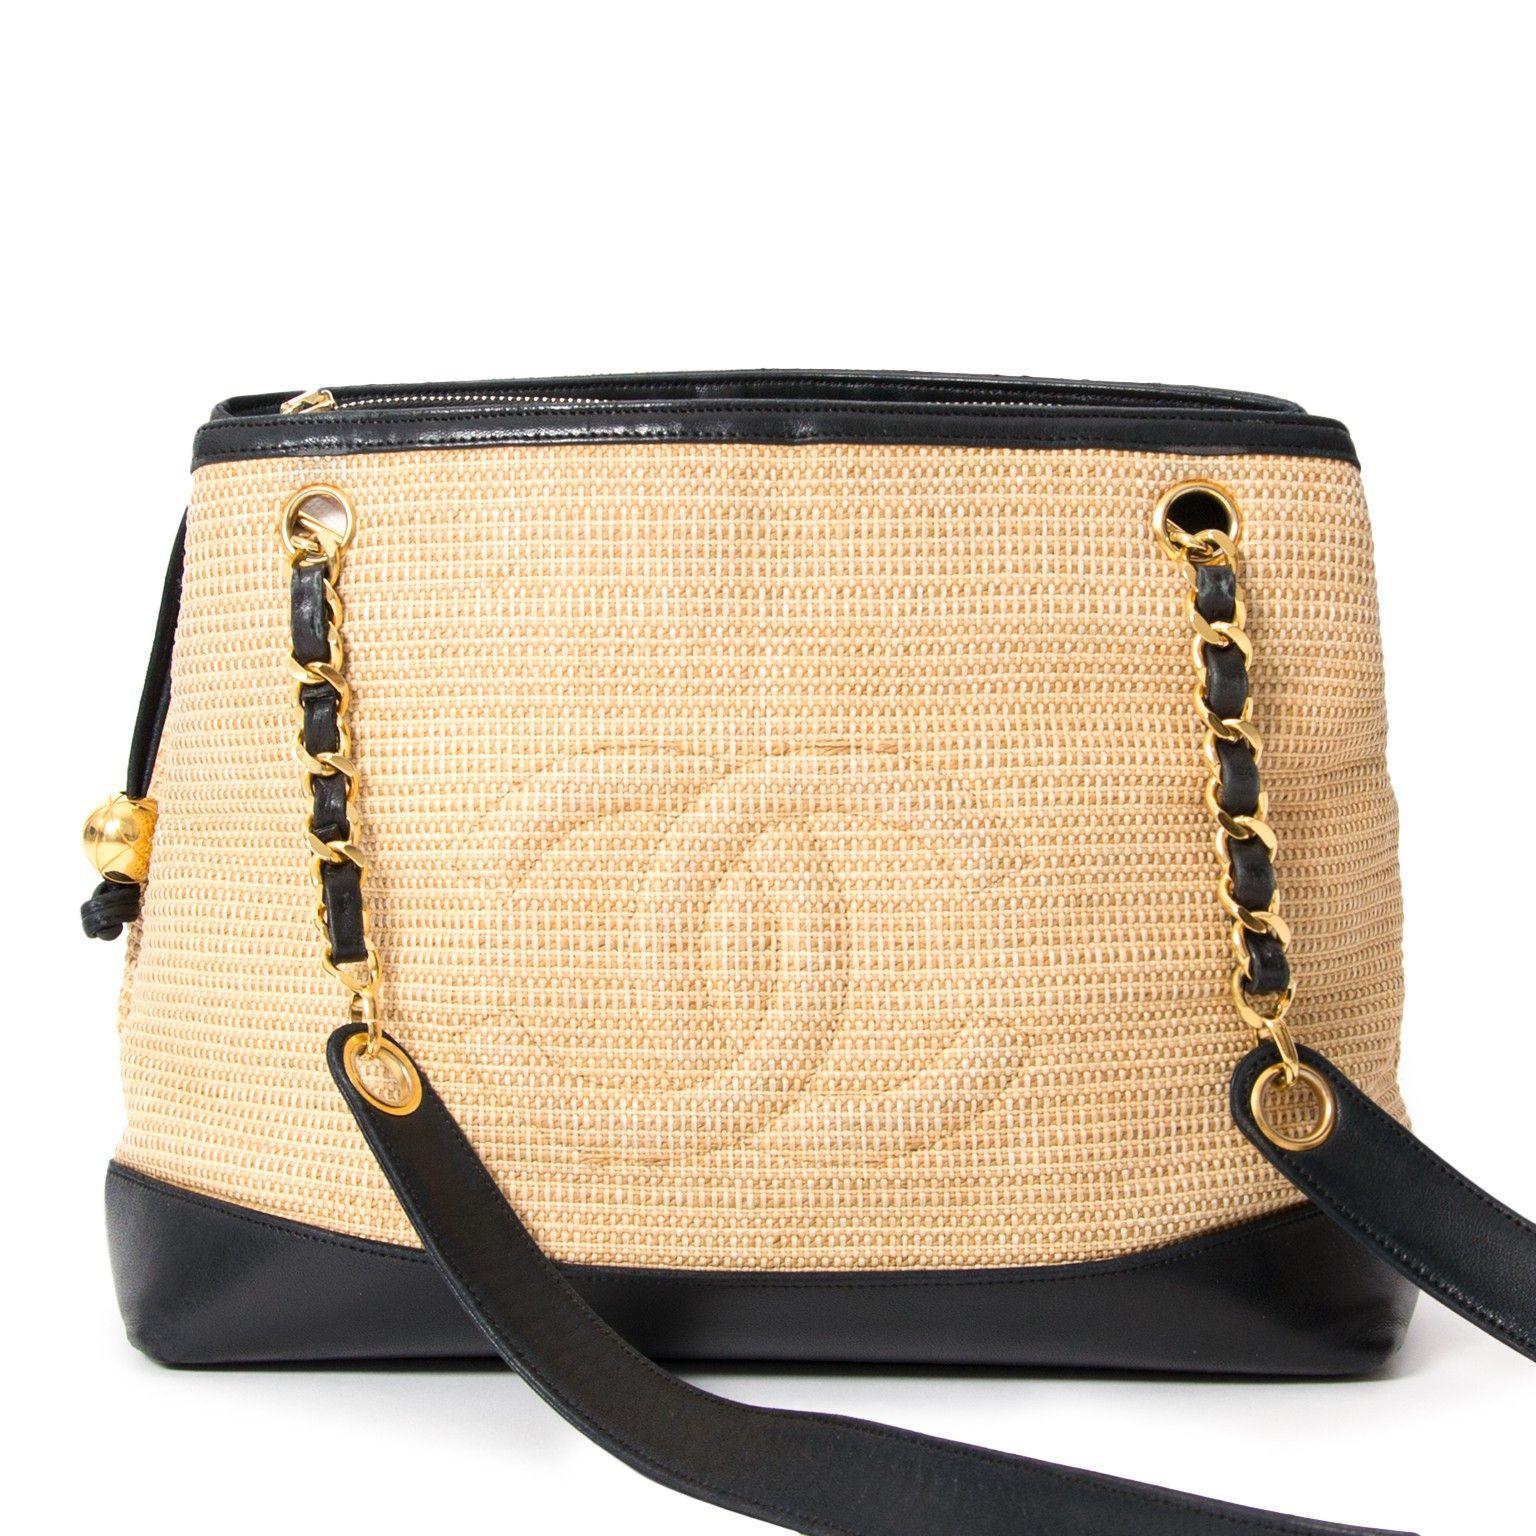 67a863b8fc01f5 Chanel Woven Raffia Shoulderbag webshop LabelLOV designer bags vintage